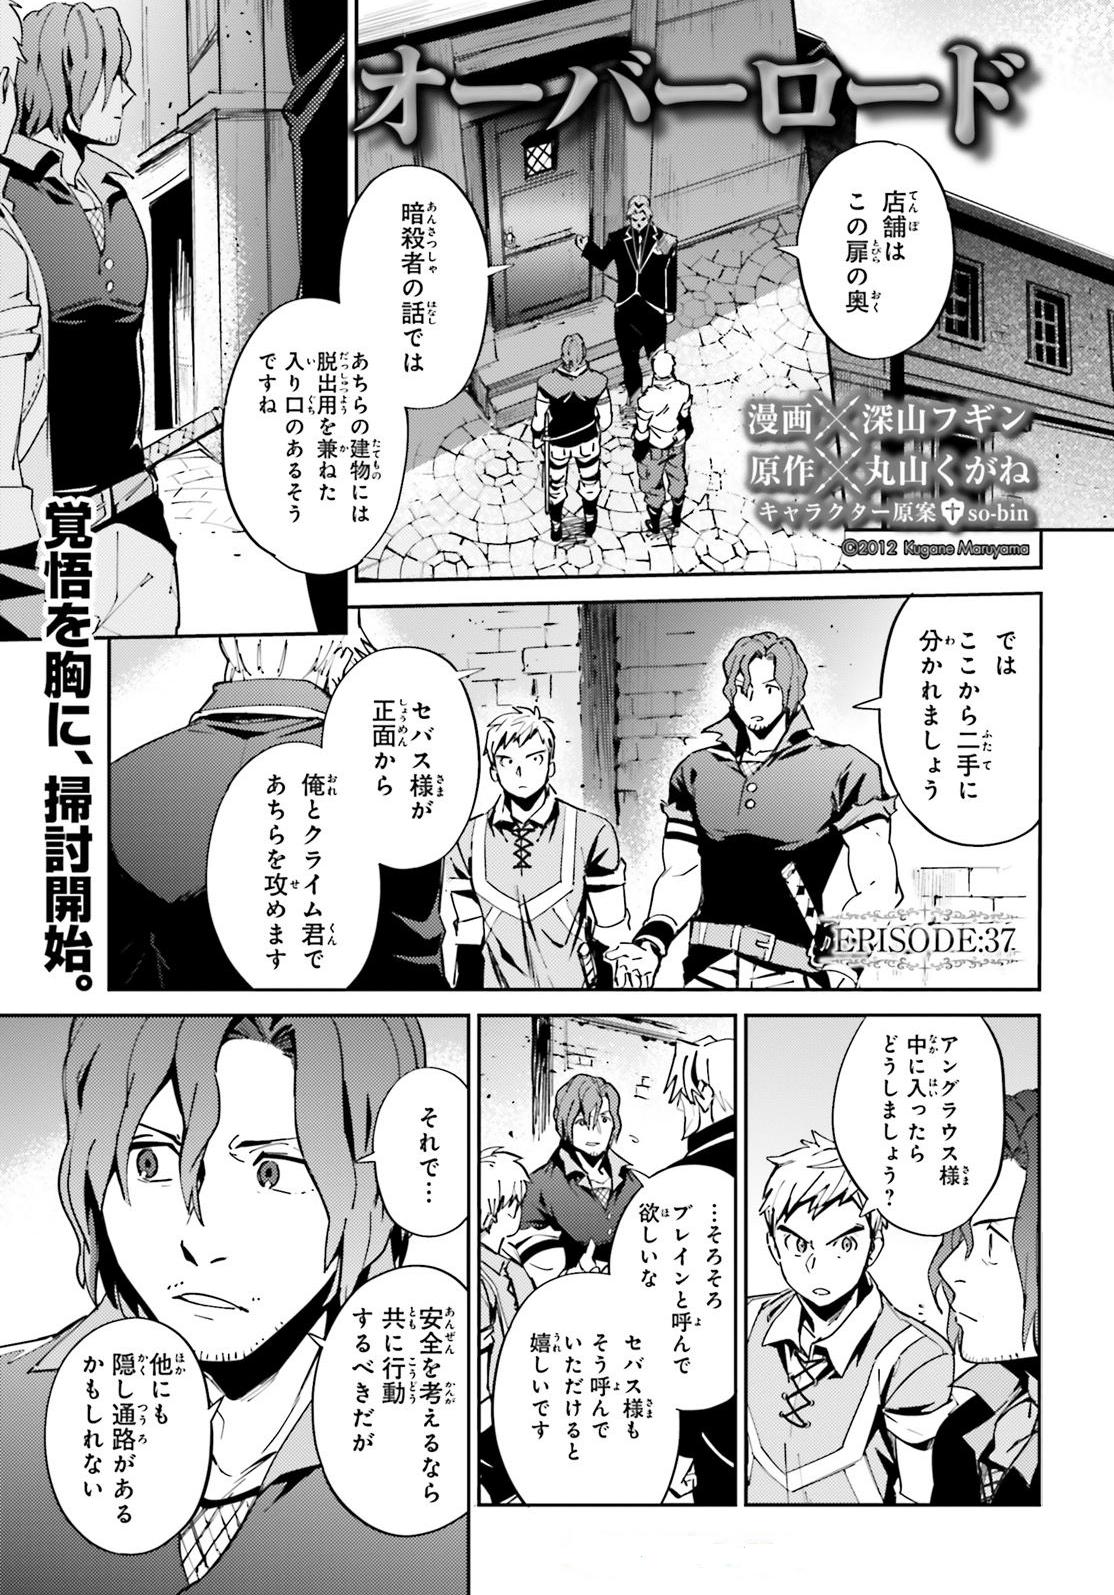 Overlord Manga Chapter 37